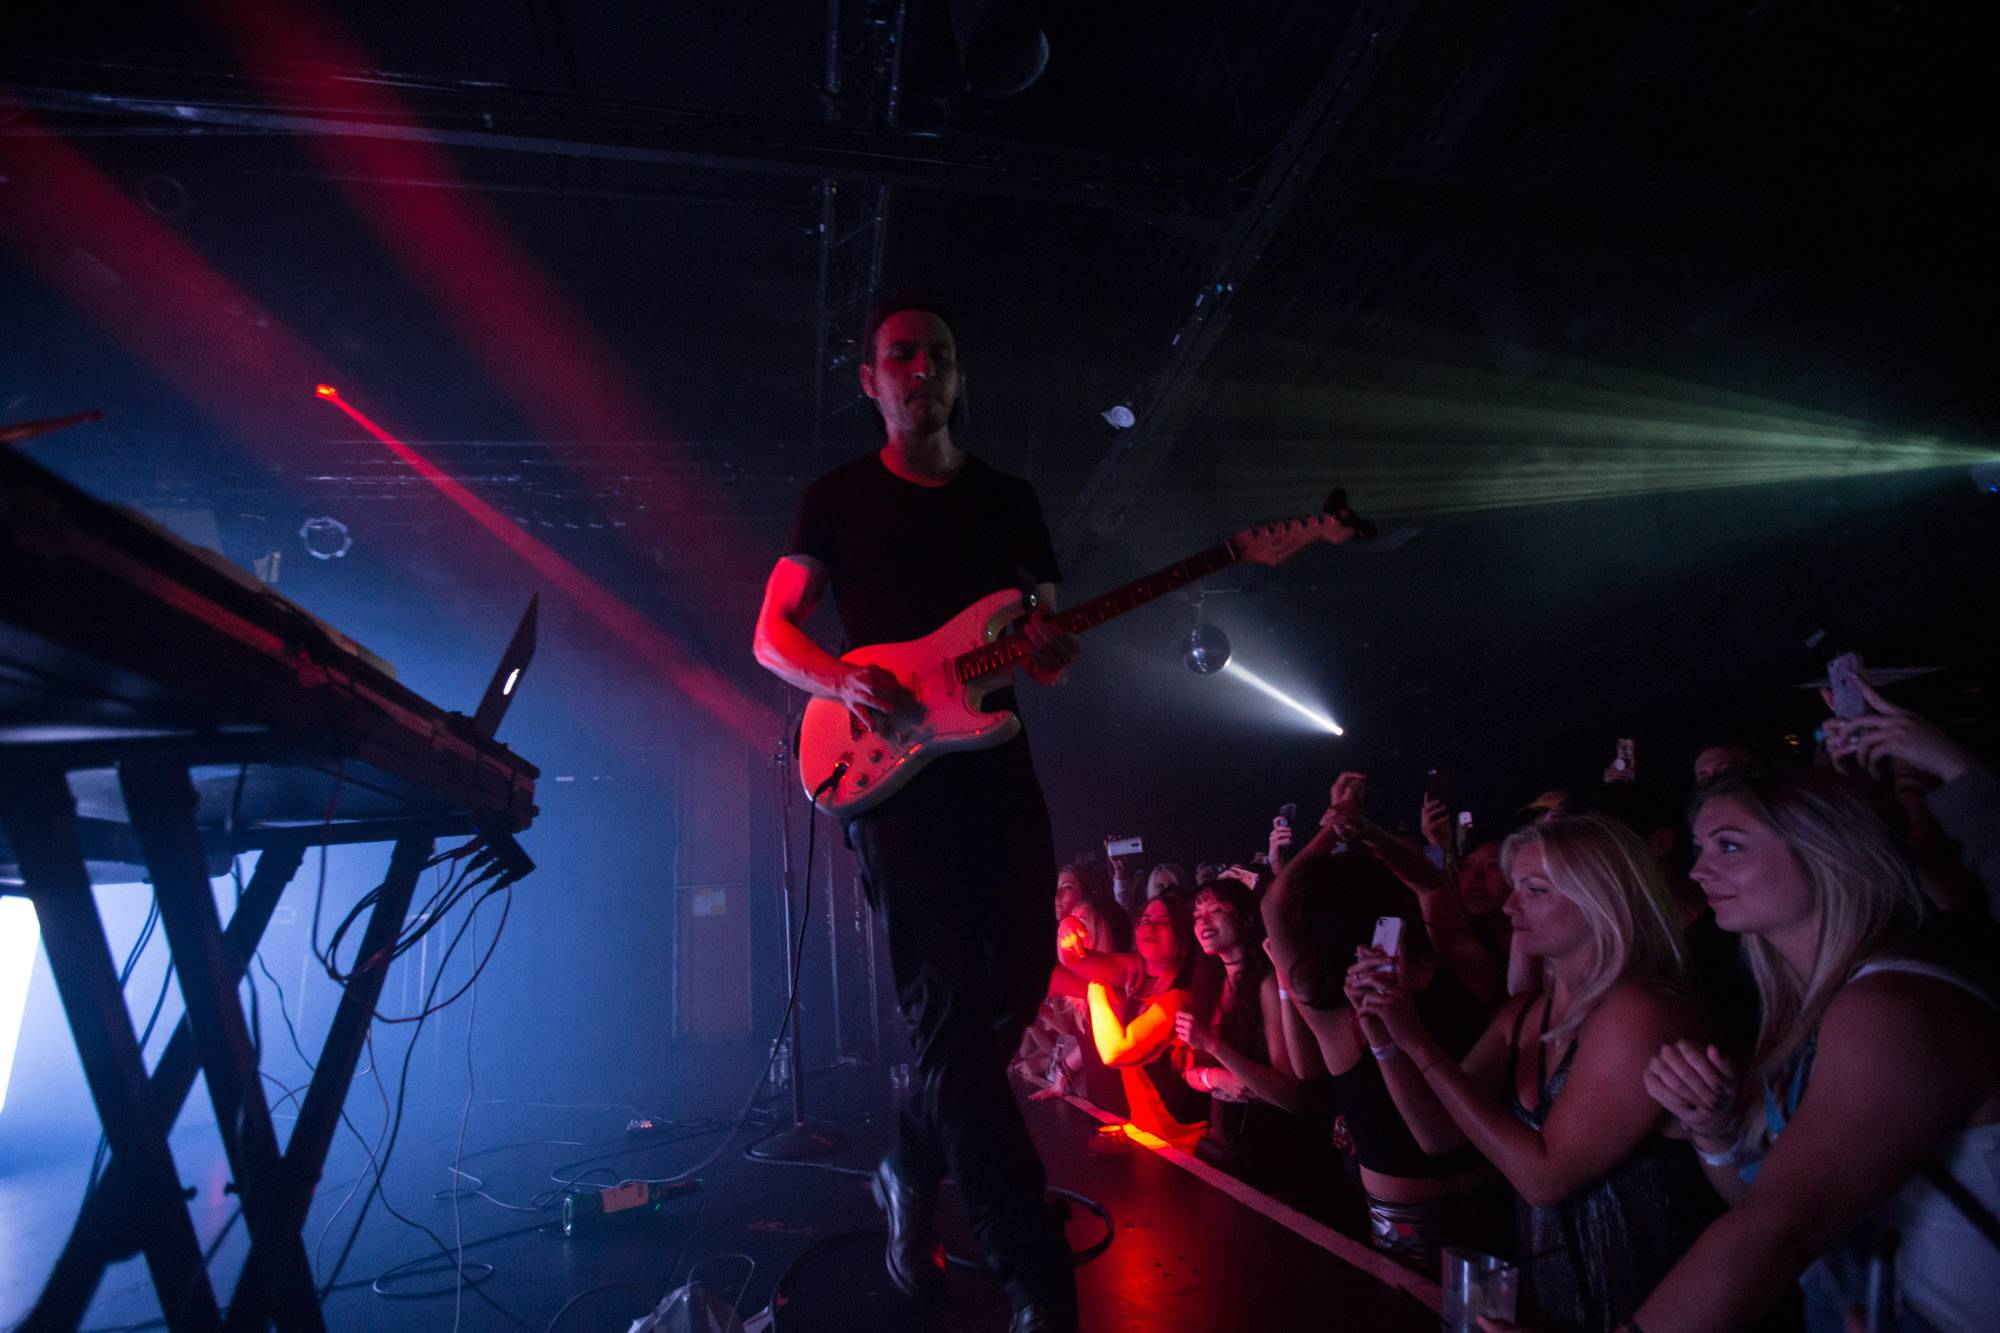 Two Feet at the Echoplex, Los Angeles, Aug 8 2017. Kirk Chantraine photo.